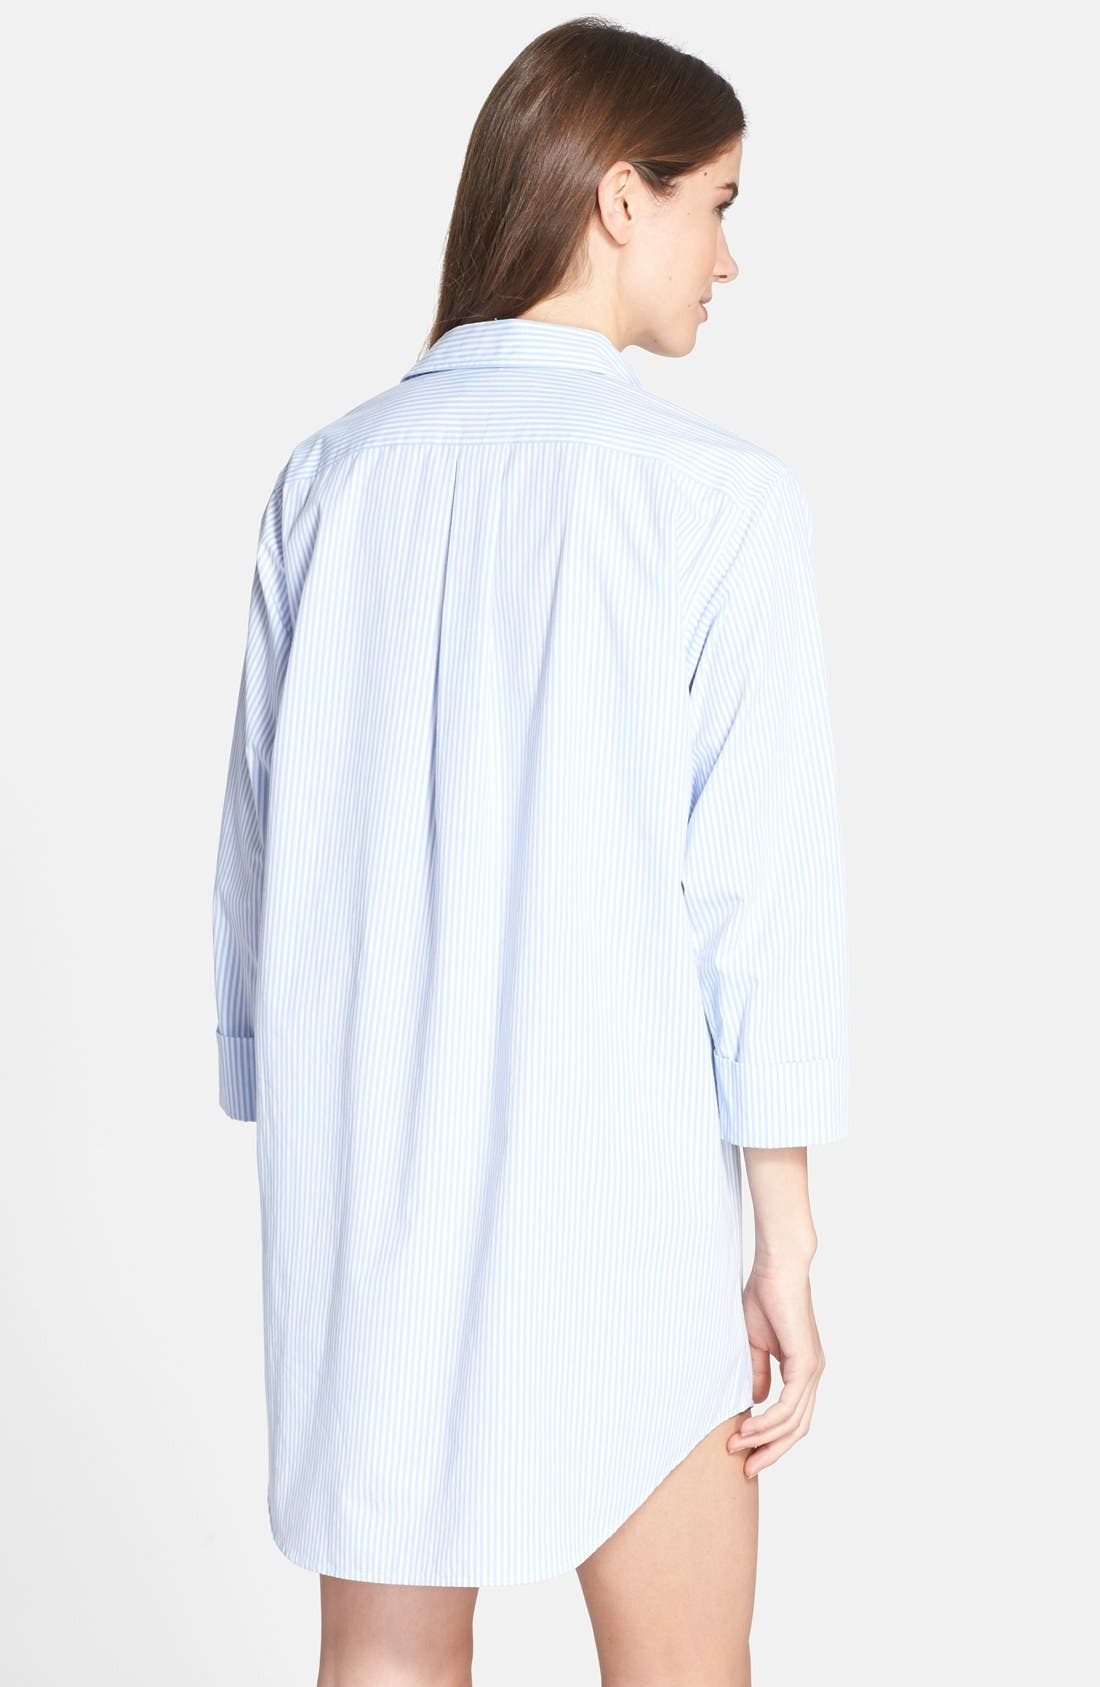 Cotton Poplin Sleep Shirt,                             Alternate thumbnail 8, color,                             452